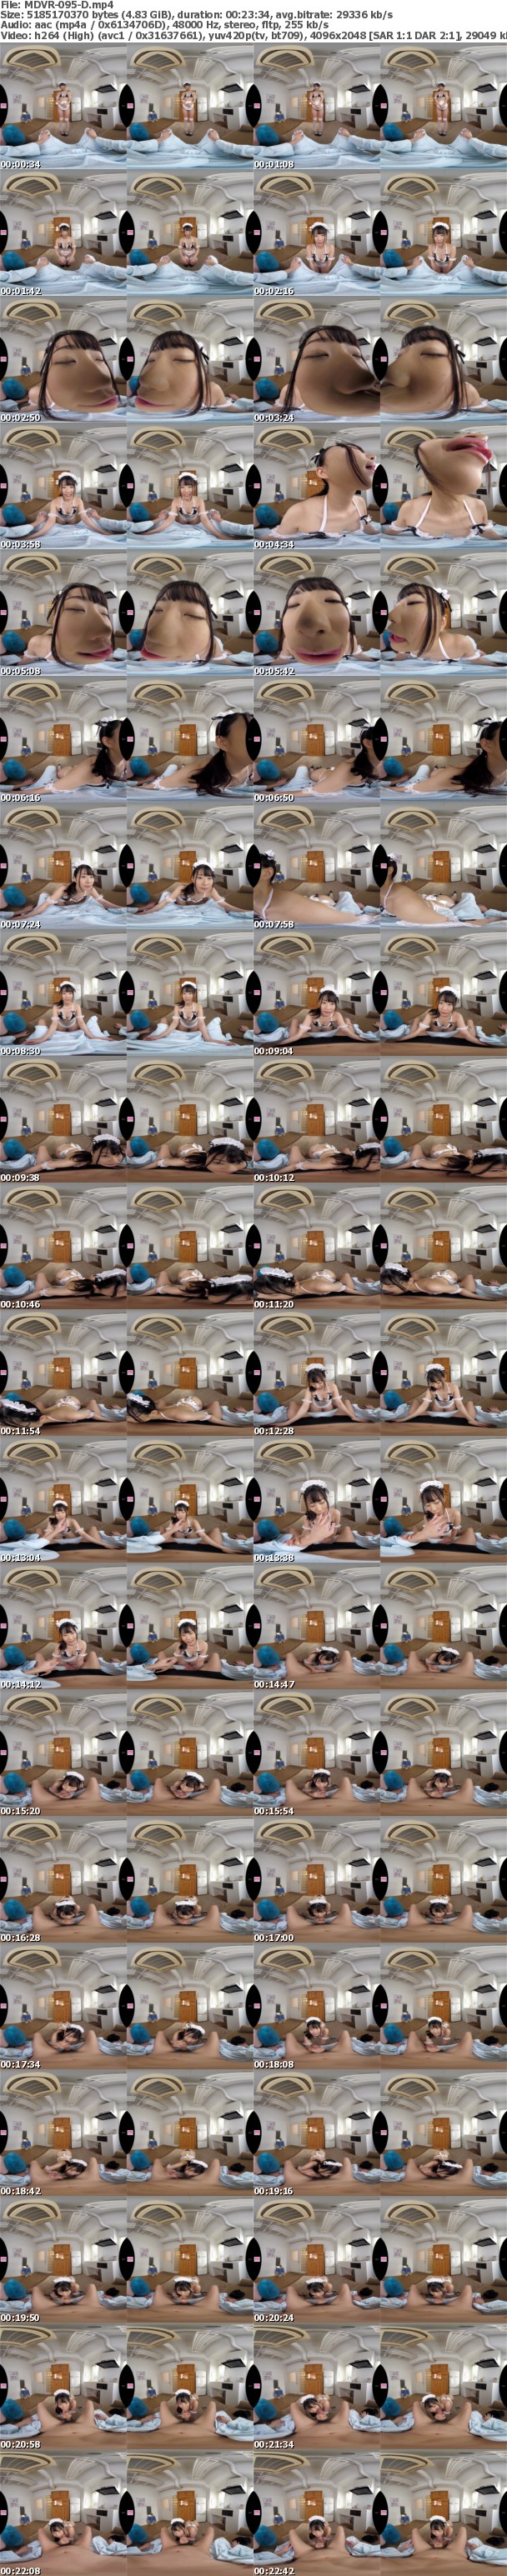 (VR) MDVR-095 【河合ゆいVR初登場!】HQ高画質×バイノーラル録音×2SEX収録! 正常位は抜き挿しバッチリアングル&極みアングルどちらも収録!ヨダレたっぷりキスたっぷり全裸満載の長尺VR!